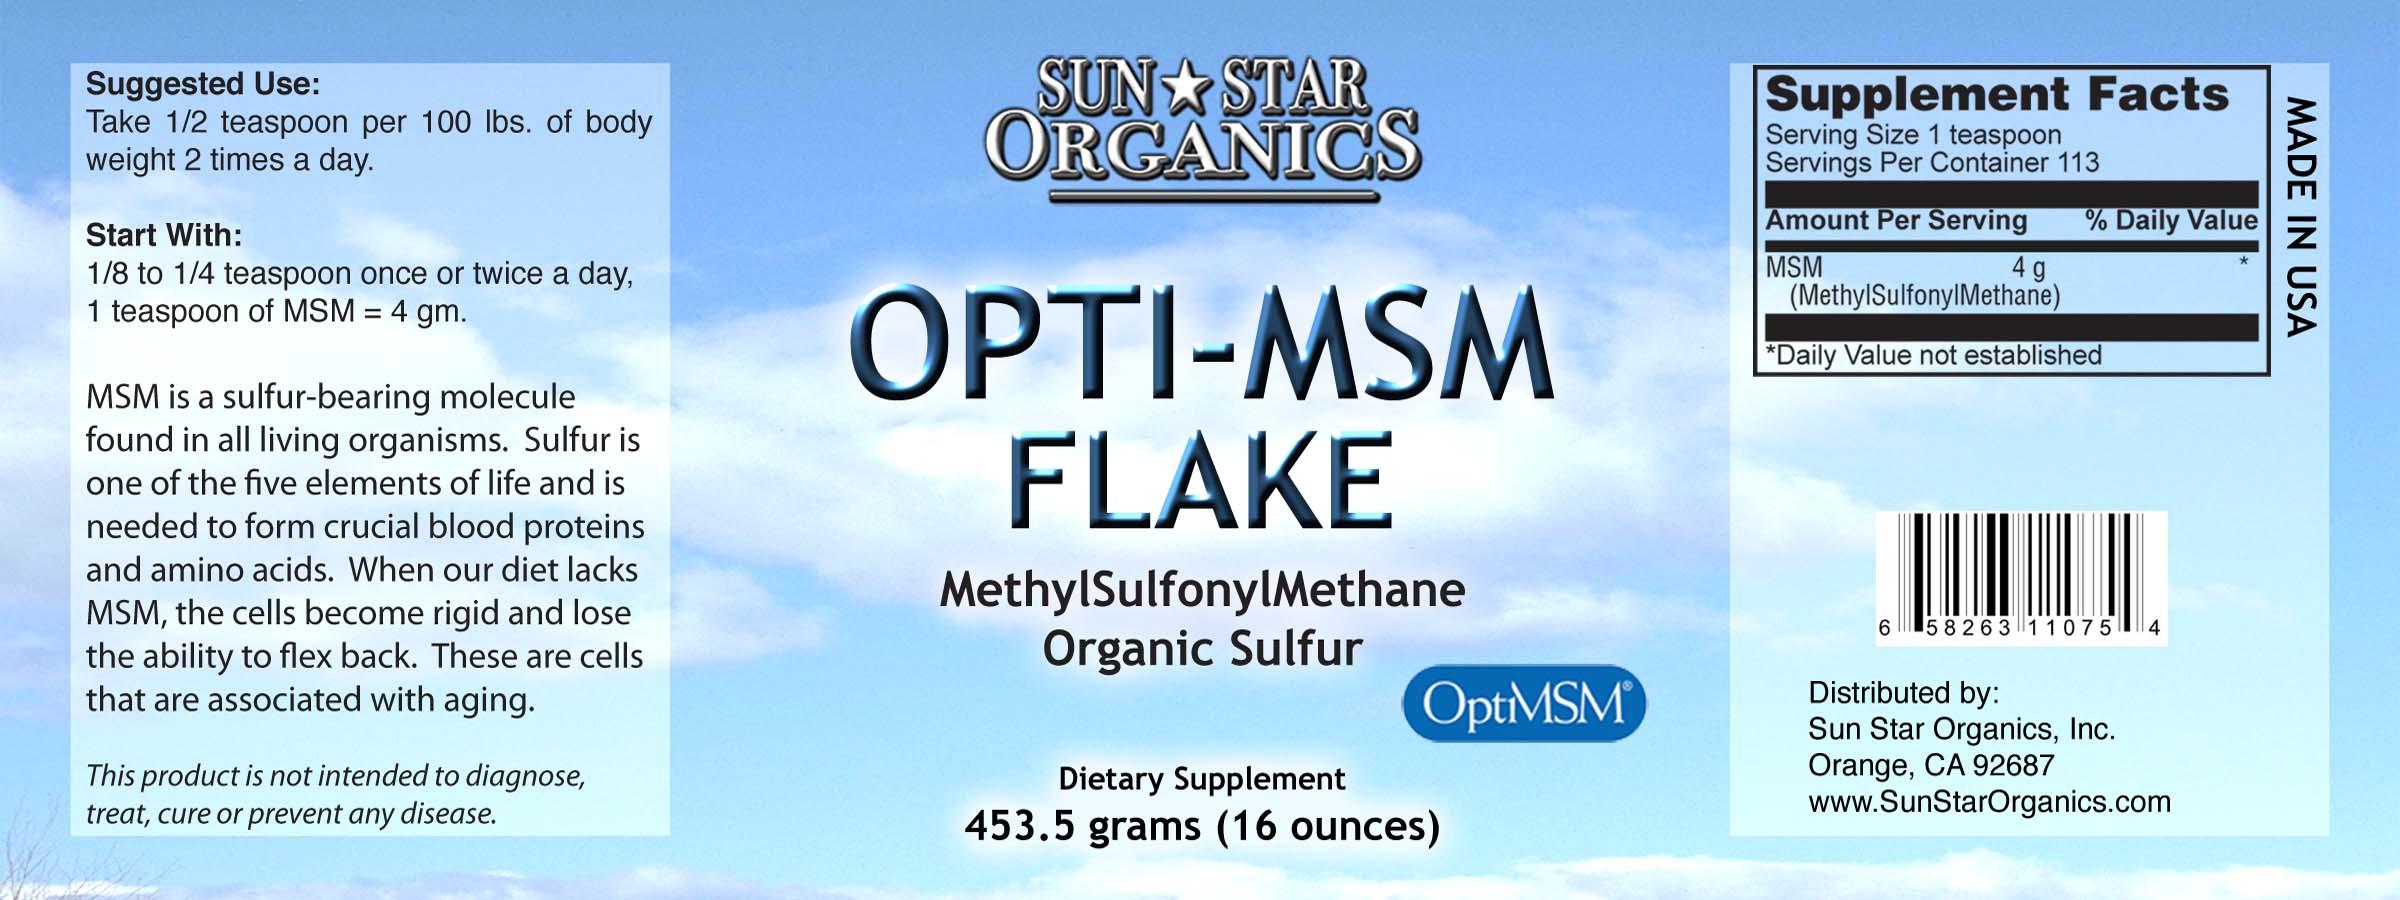 Opti-MSM Flake